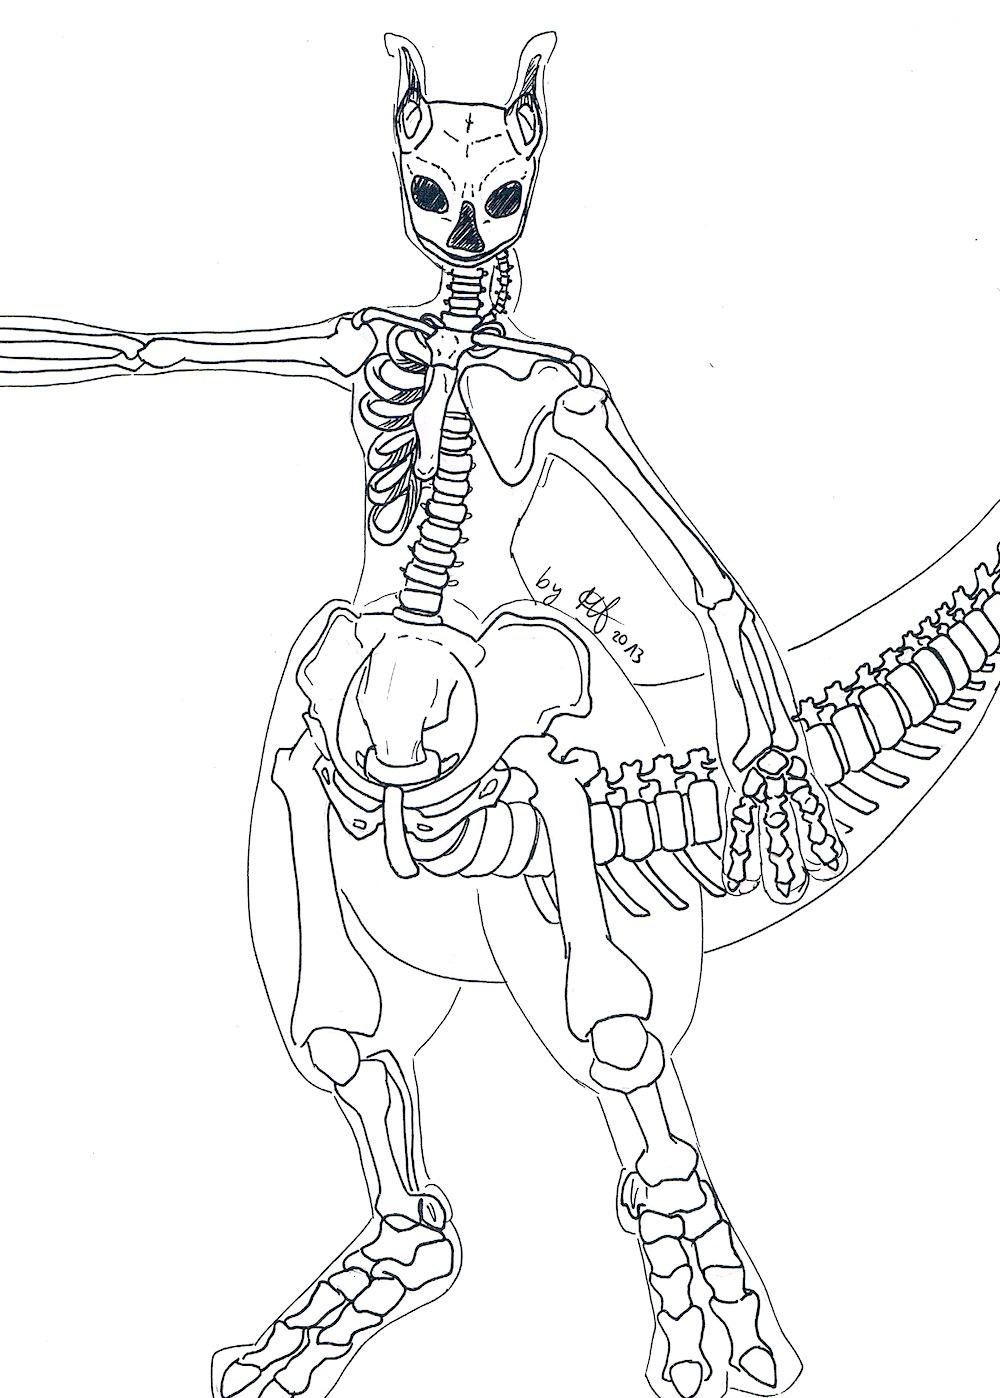 Mewtwo S Skeleton By Wasserwaldnymphe On Deviantart